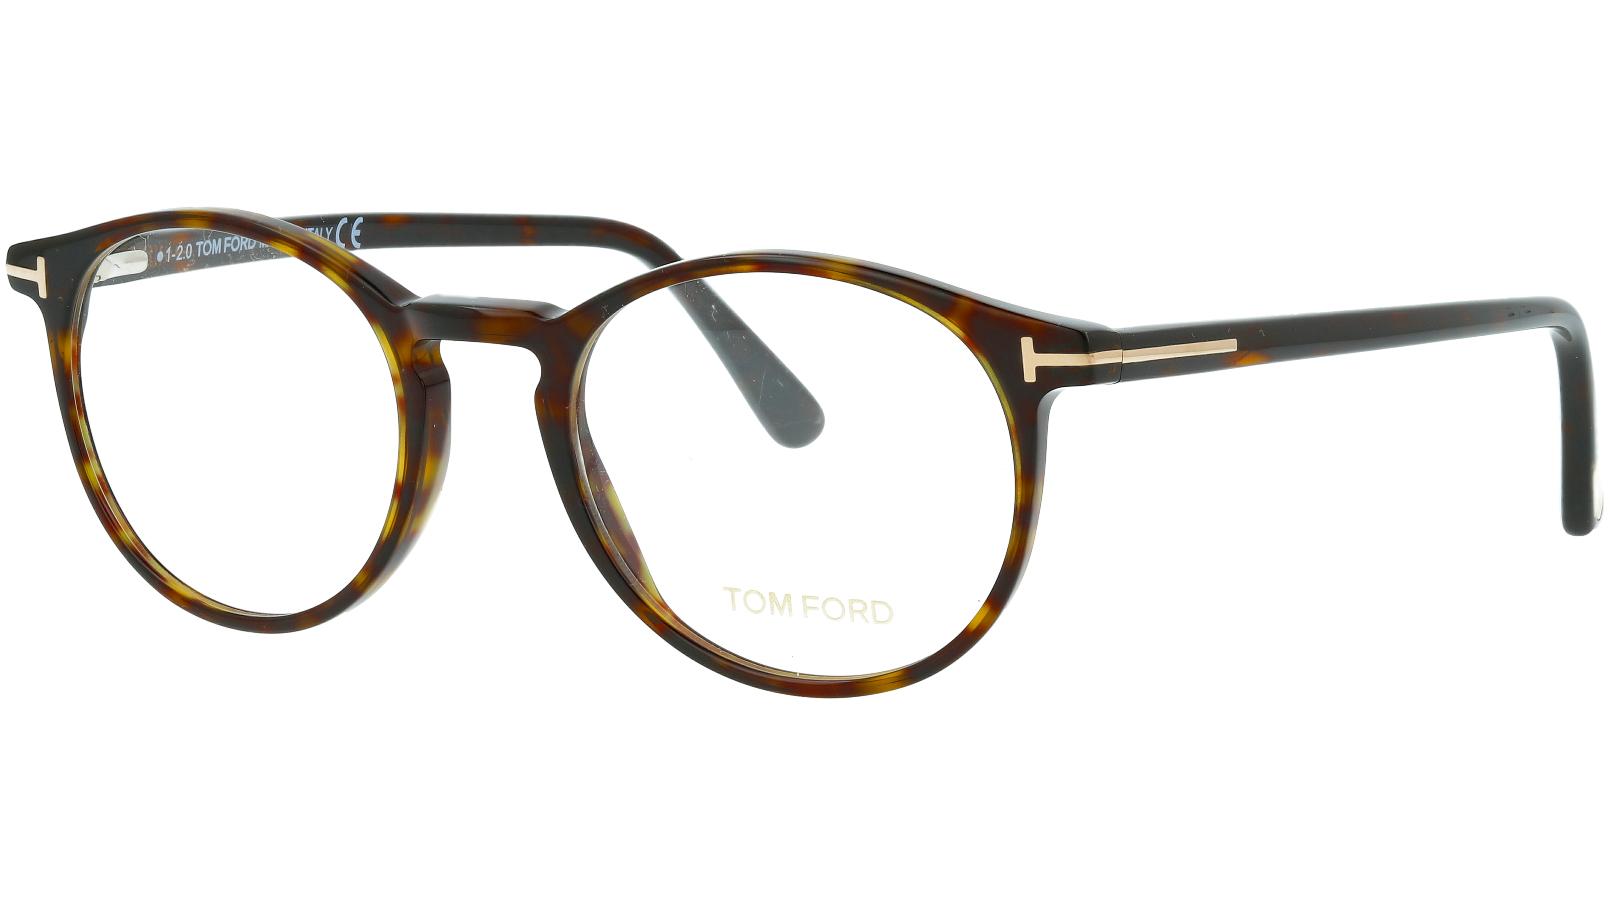 Tom Ford TF5294 052 50 Dark Glasses